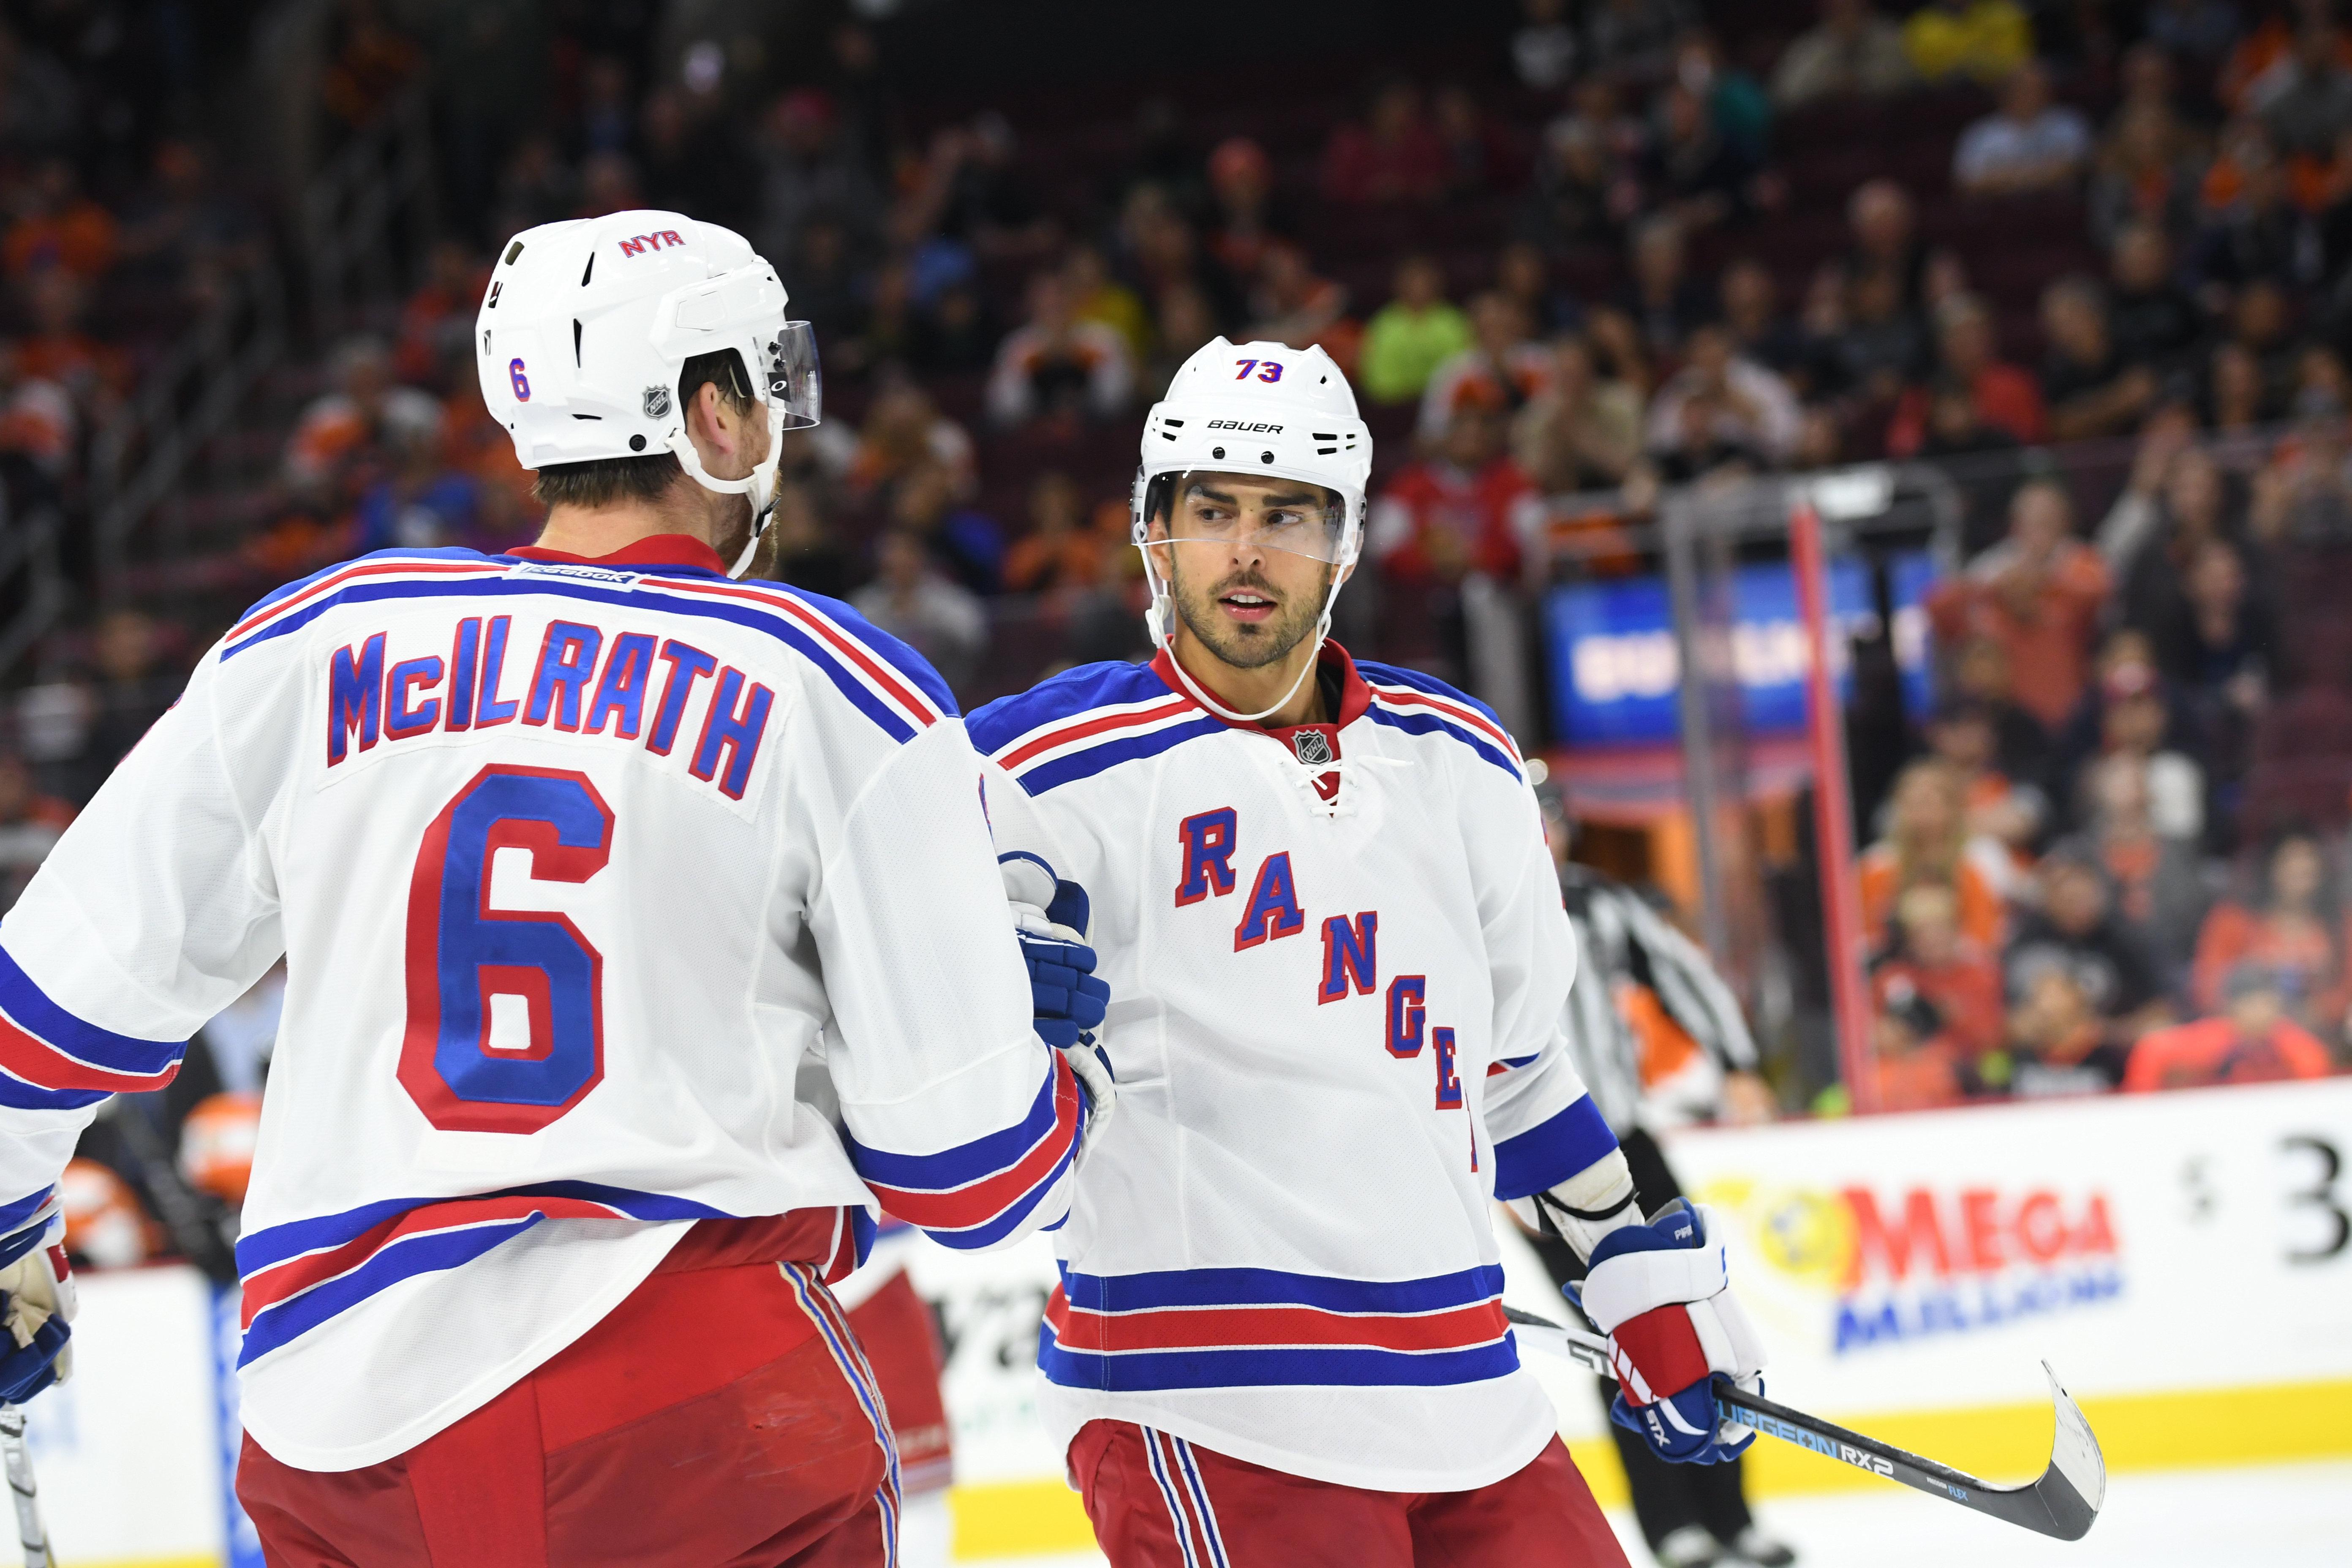 NHL: OCT 03 Preseason - Rangers at Flyers